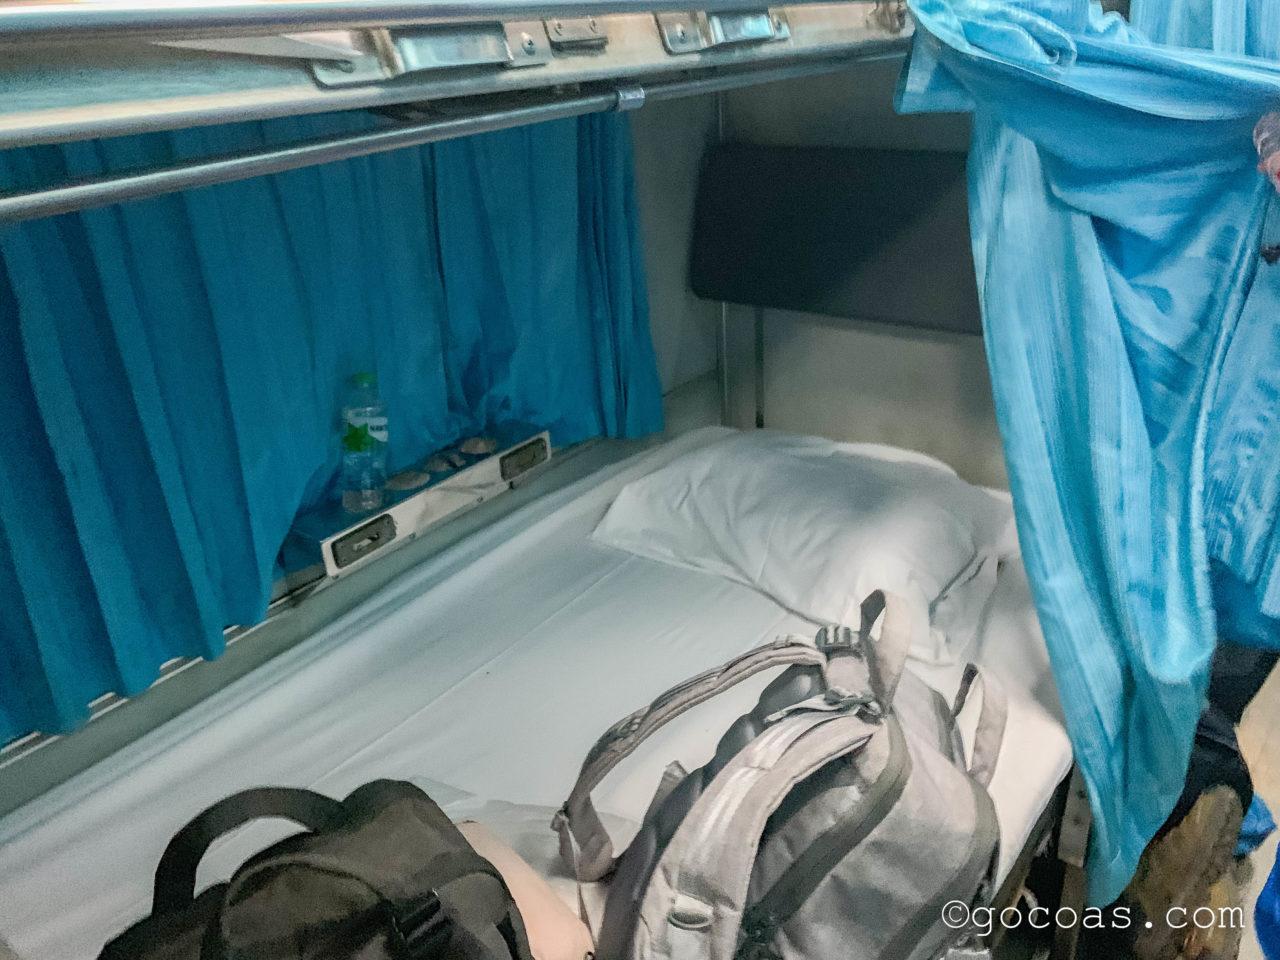 Hua Lamphong駅で乗った電車内の座席をベッドに変えてもらうところ